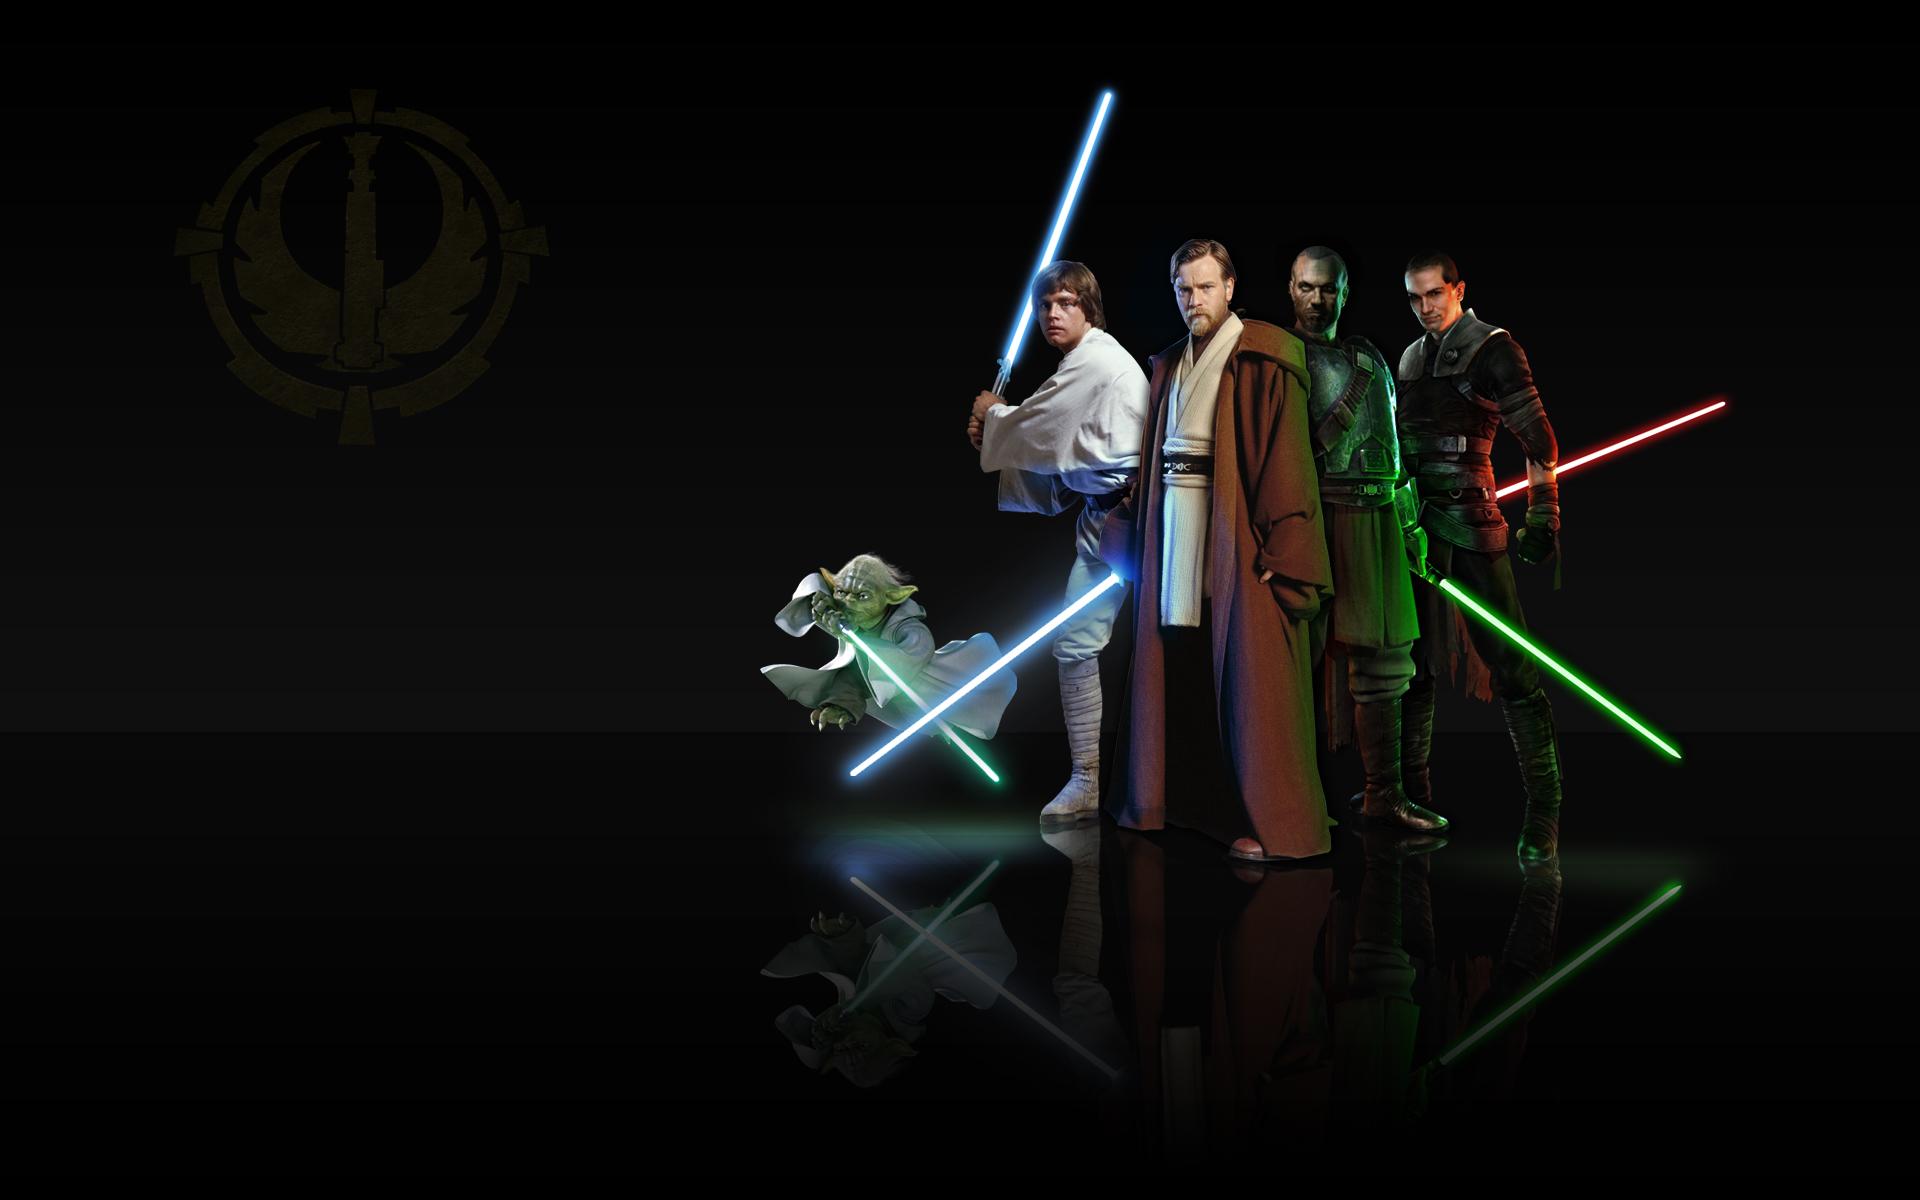 Amazing Star Wars Wallpaper 18096 1920x1200px